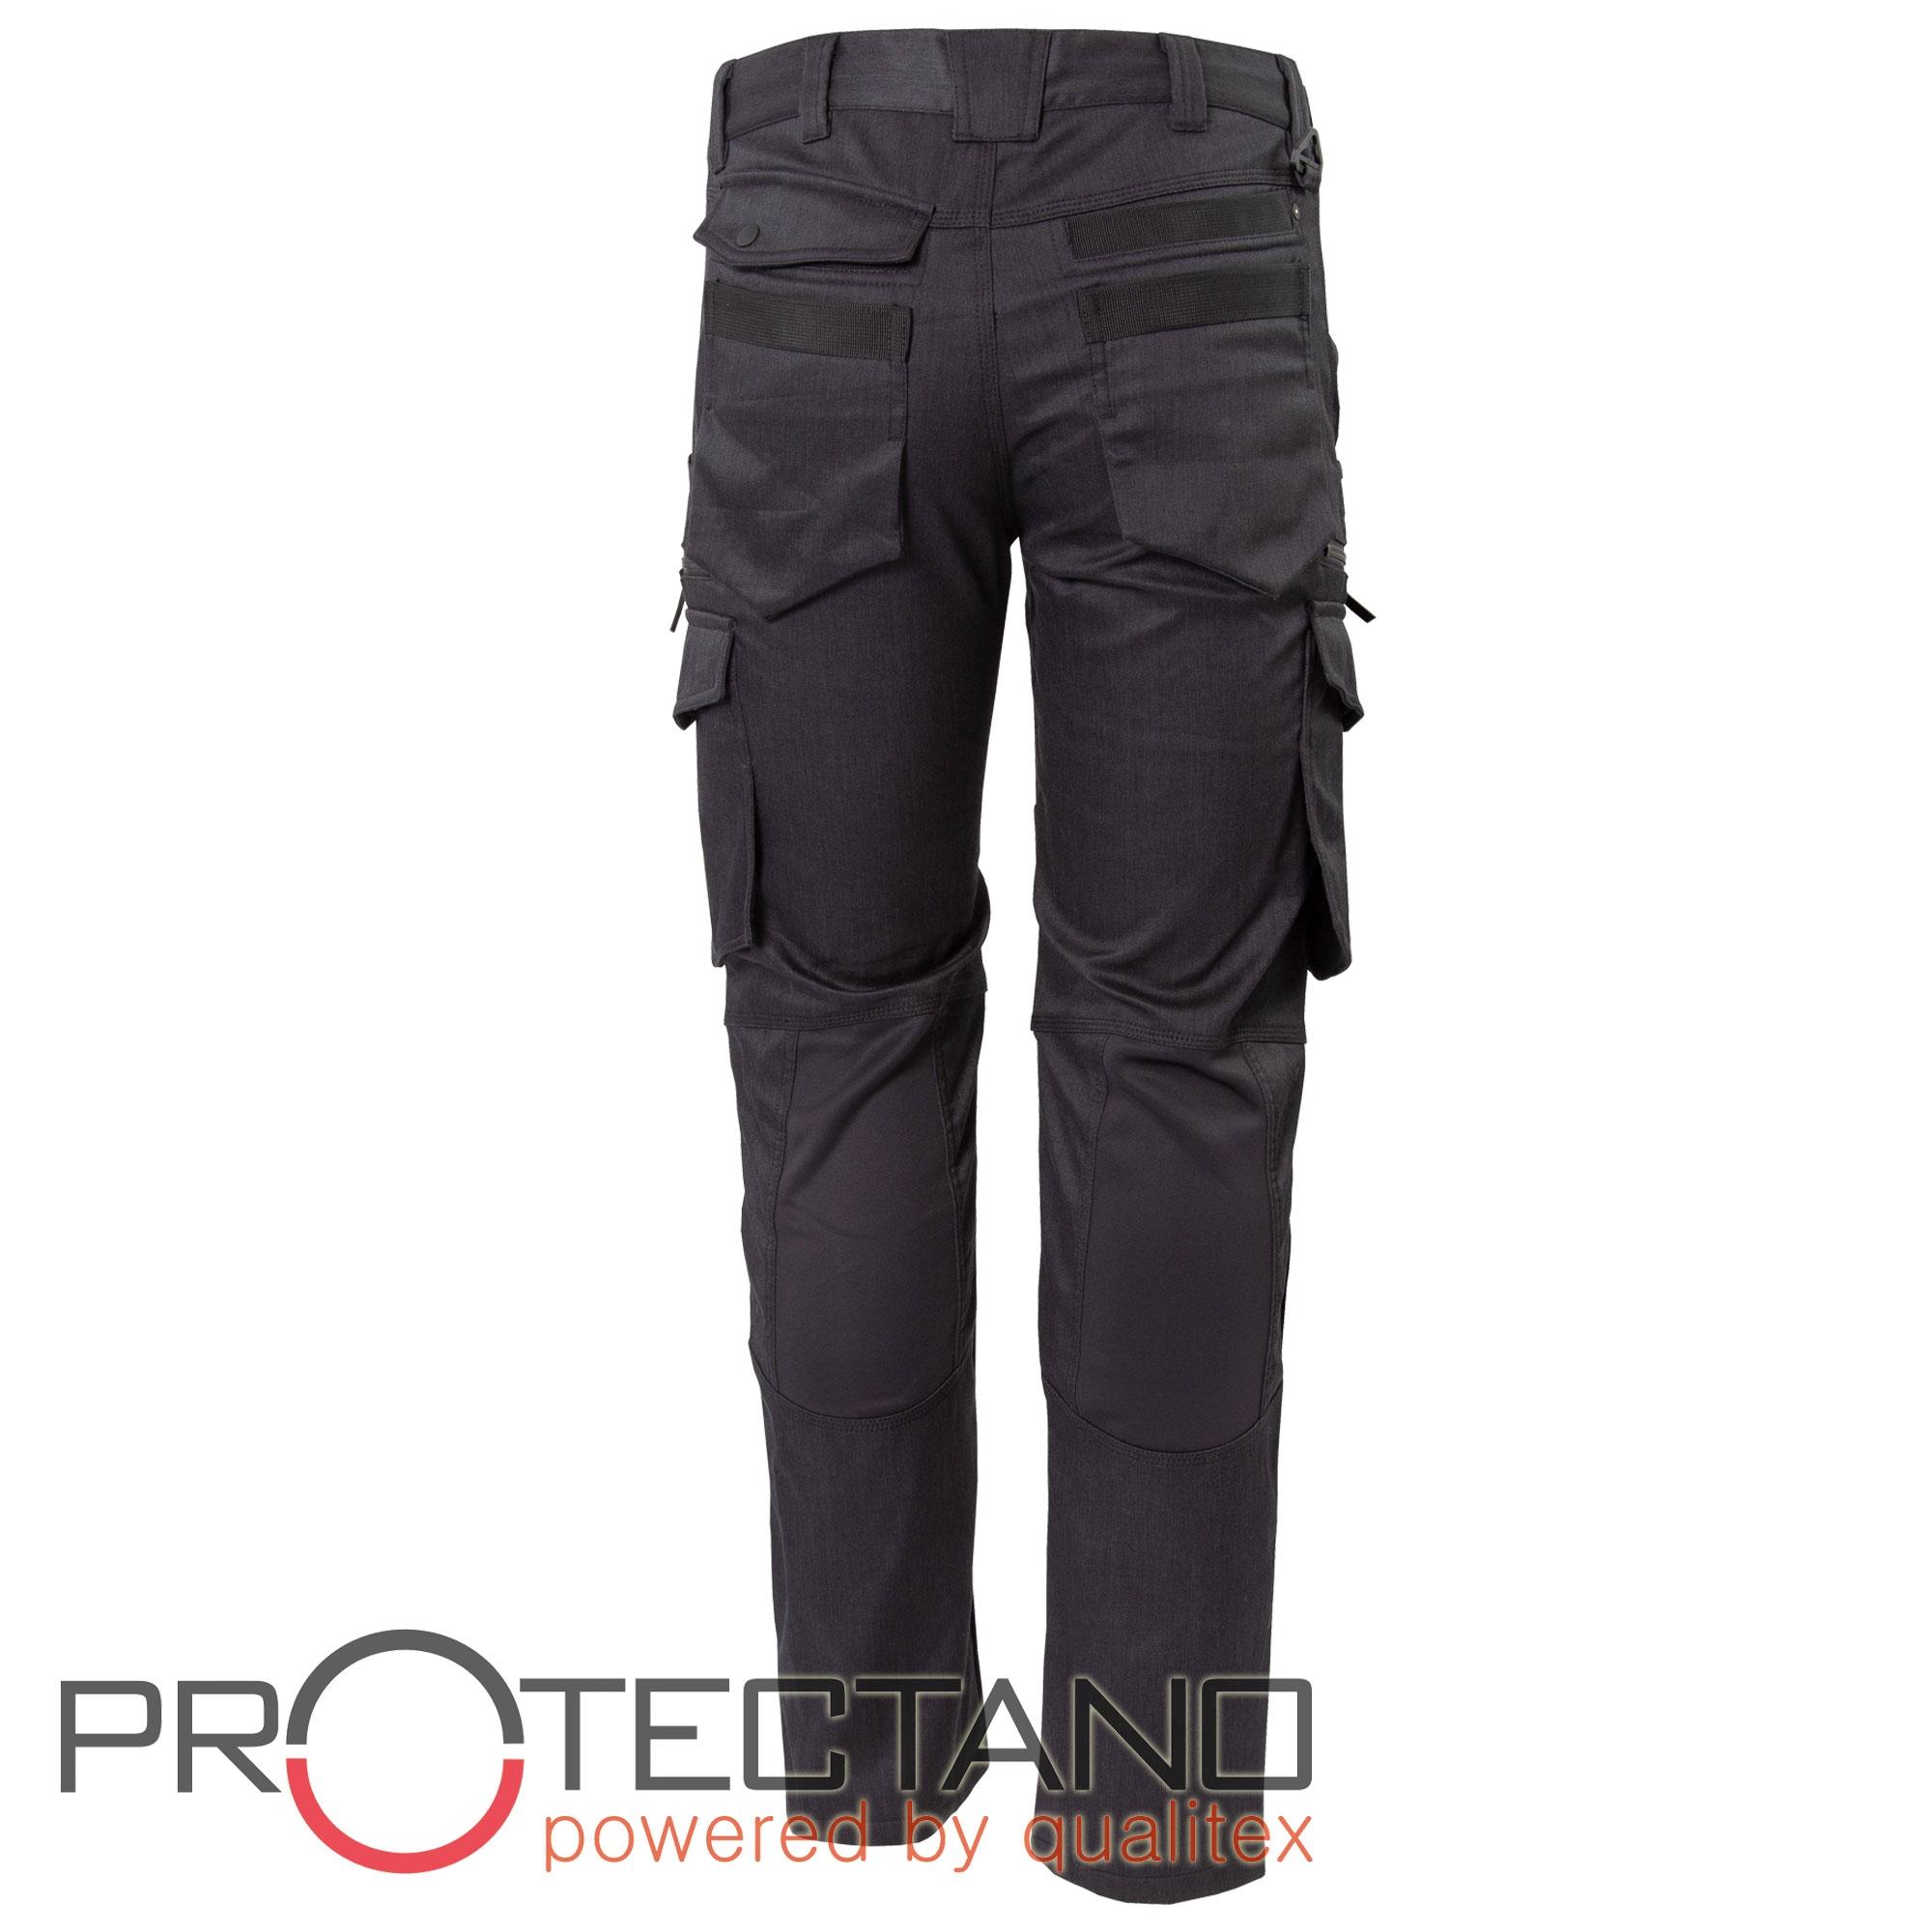 Qualitex-Protectano-Winter-Bundhose-Arbeitshose-Worker-Hose-Cordura-S-3XL Indexbild 9